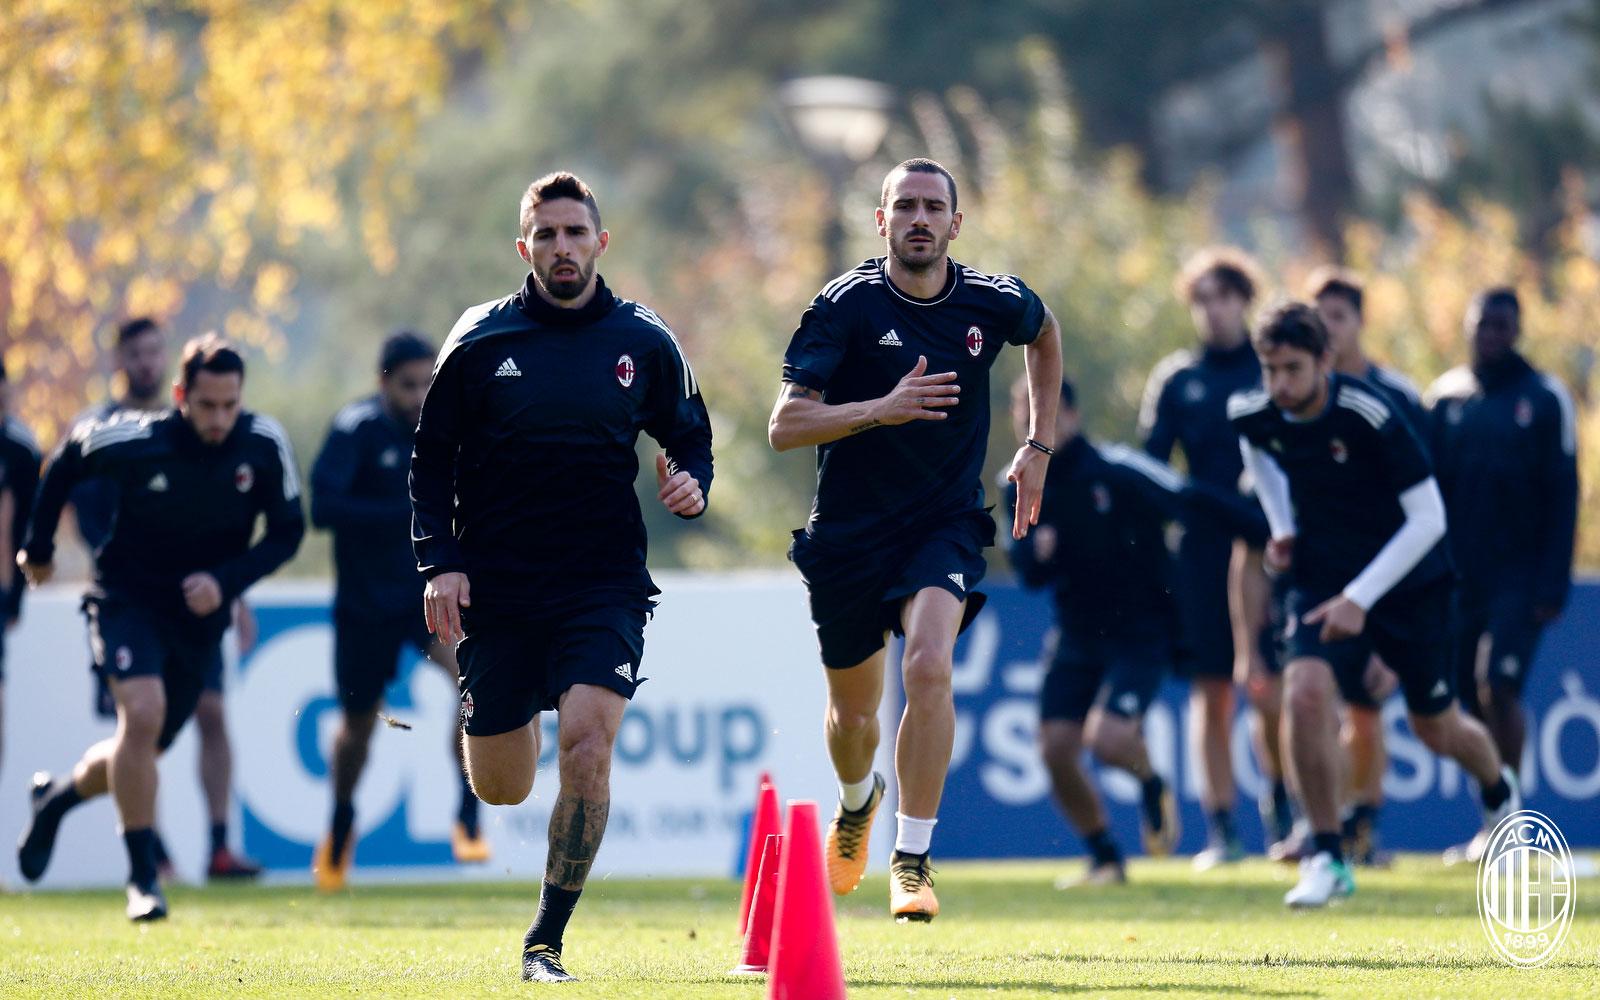 Leonardo Bonucci and Fabio Borini during training at Milanello. (@acmilan.com)